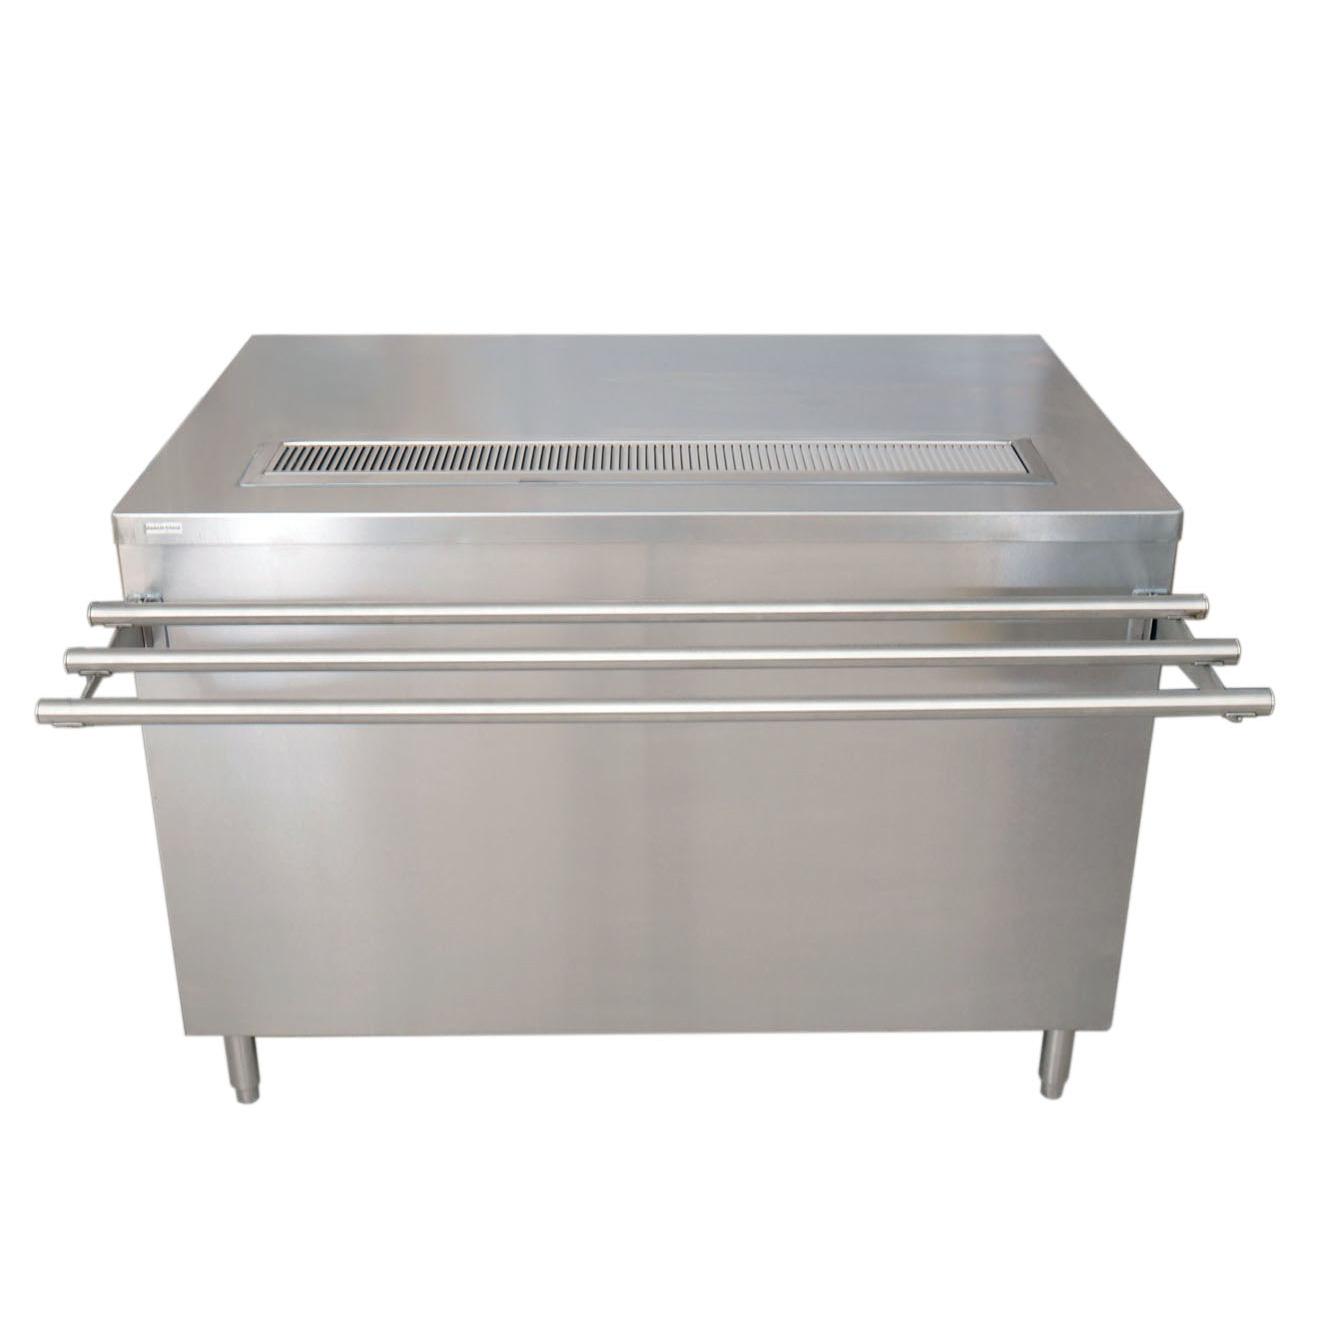 BK Resources US-3060C-H serving counter, beverage